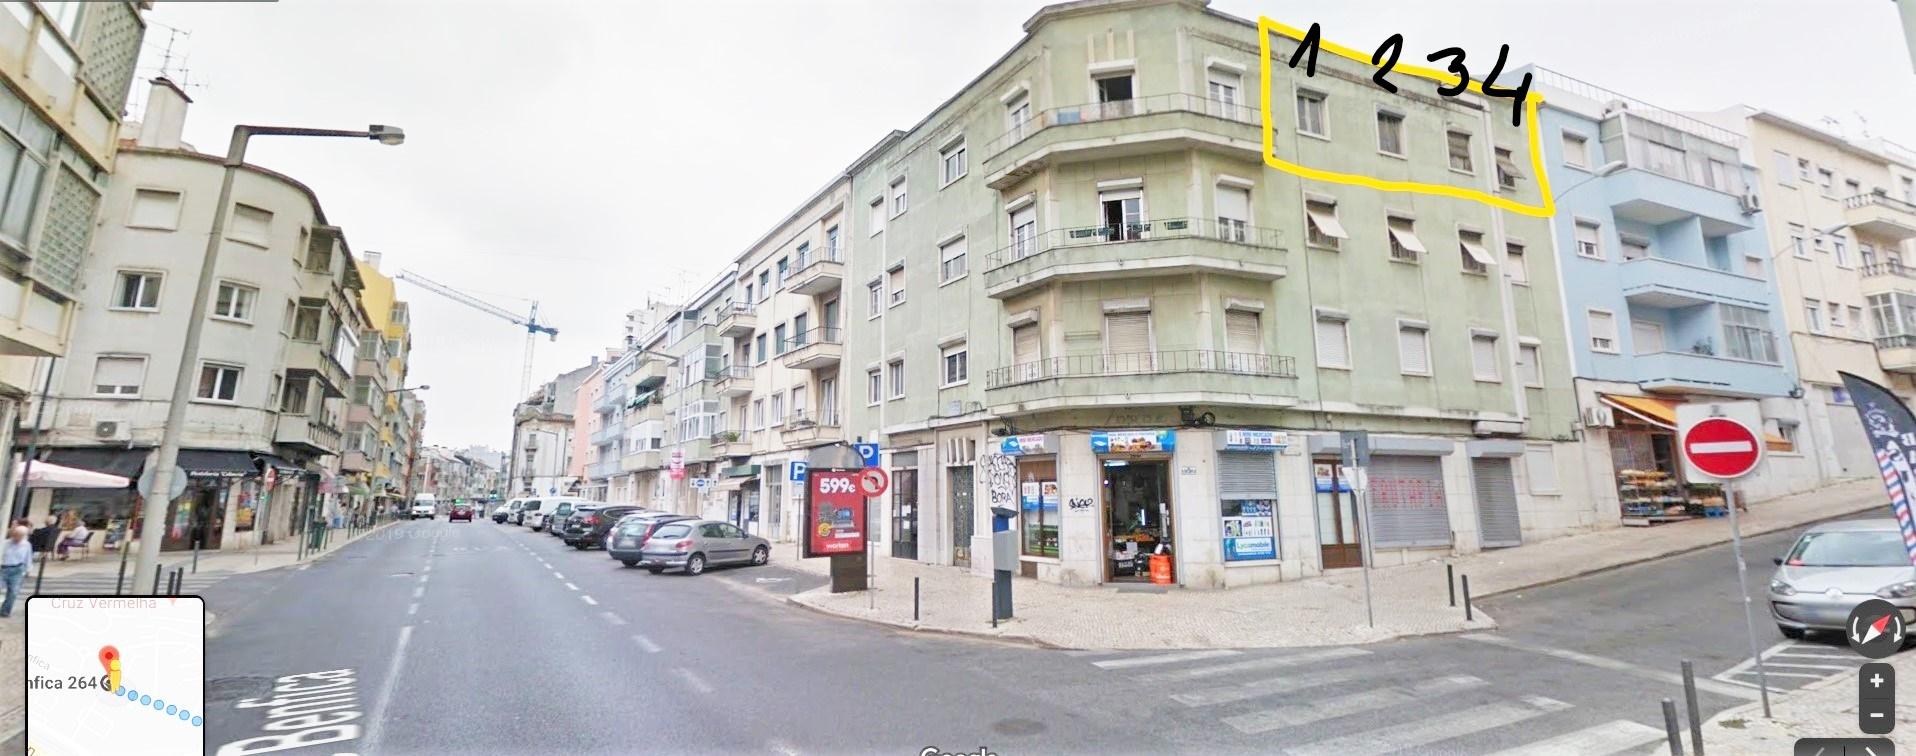 Street view_LI